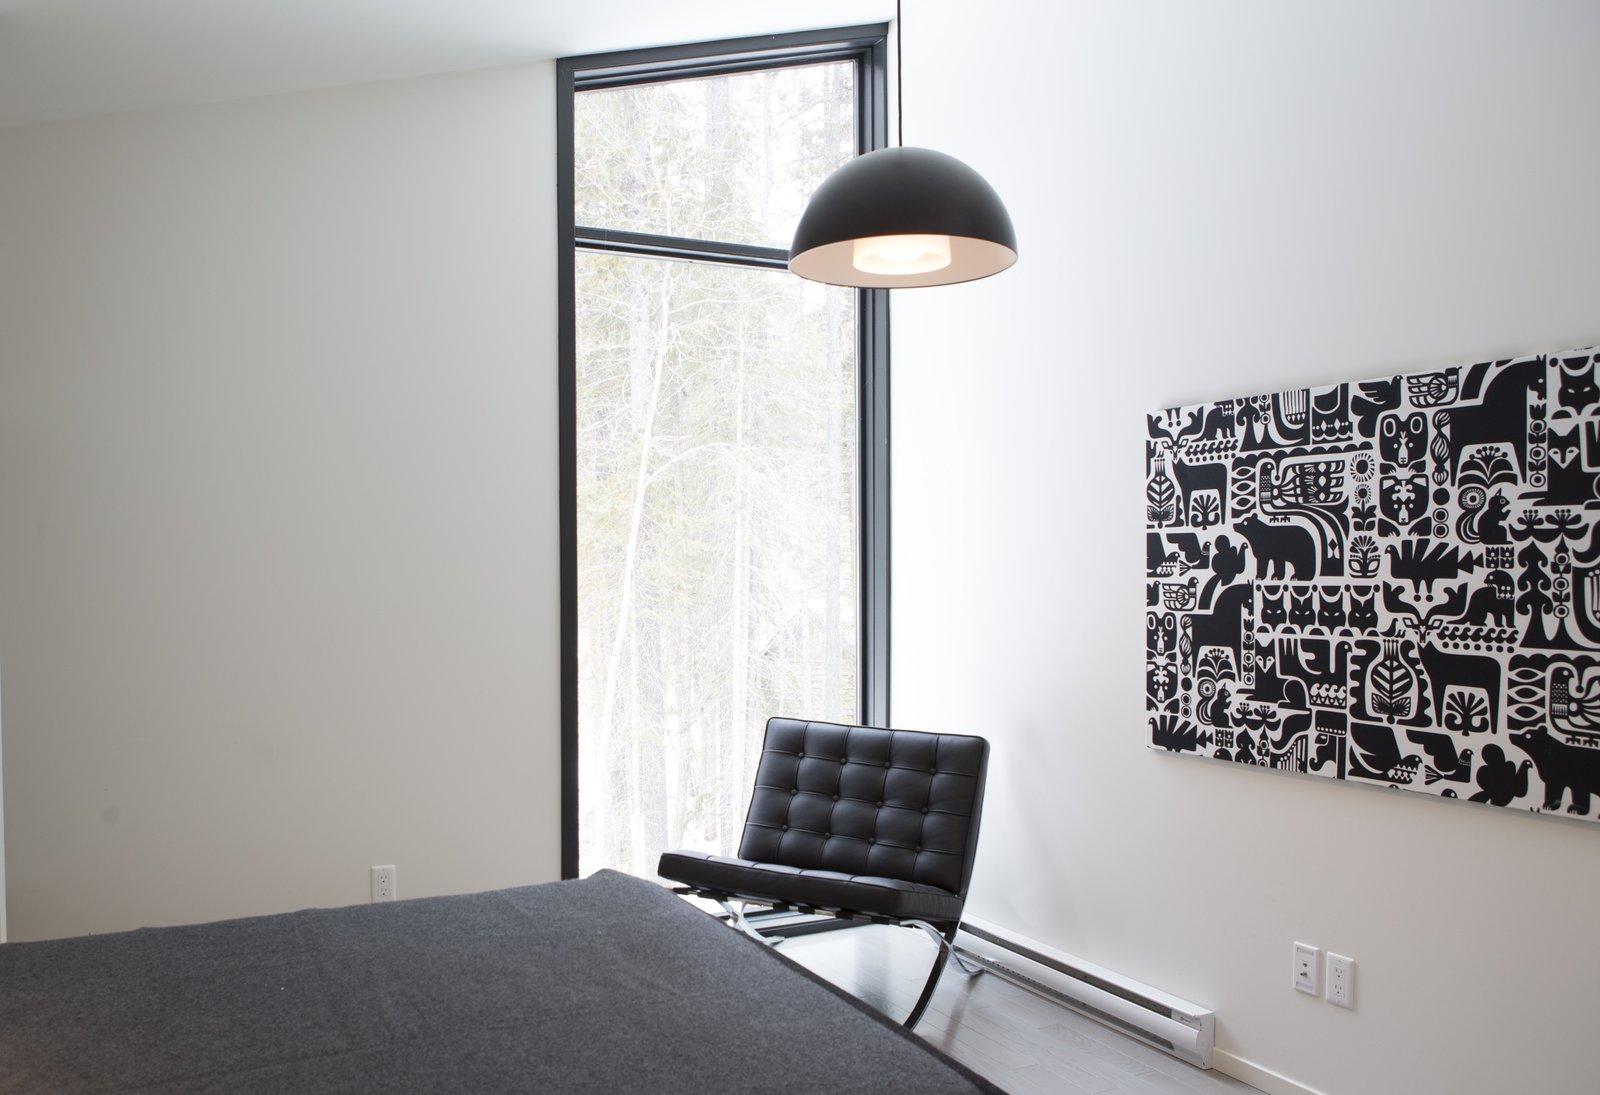 Bedroom, Night Stands, Chair, Ceiling Lighting, Medium Hardwood Floor, and Bed  Pioneer Cabin